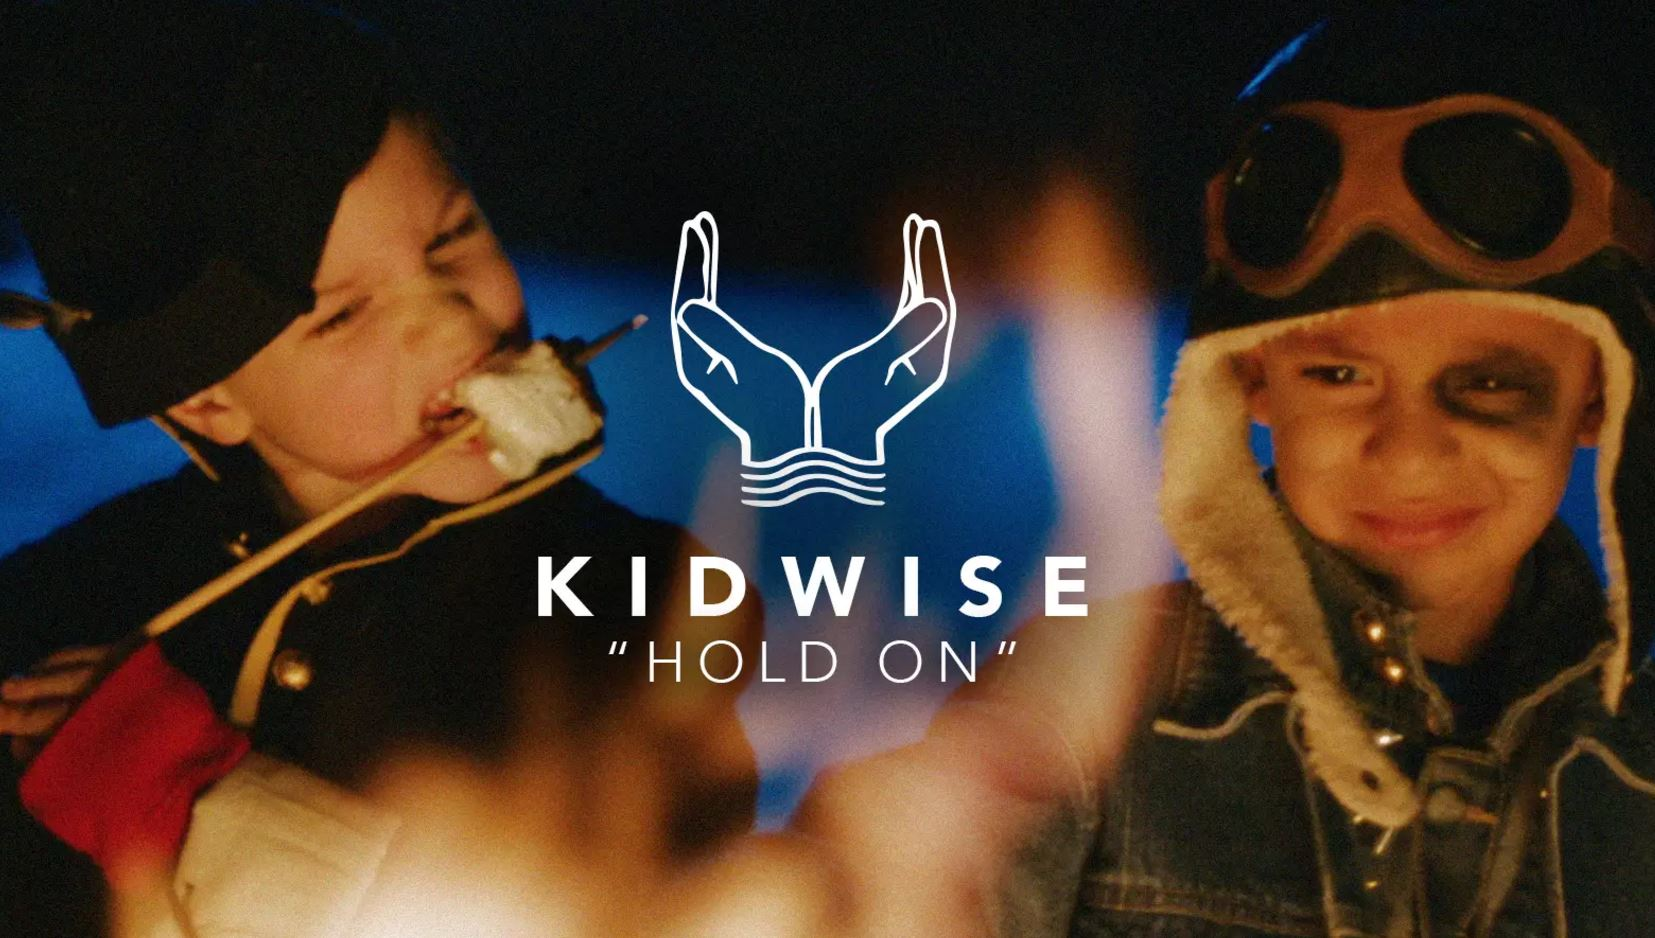 Kid Wise Casts HipNJ Kids in Viral Music Video